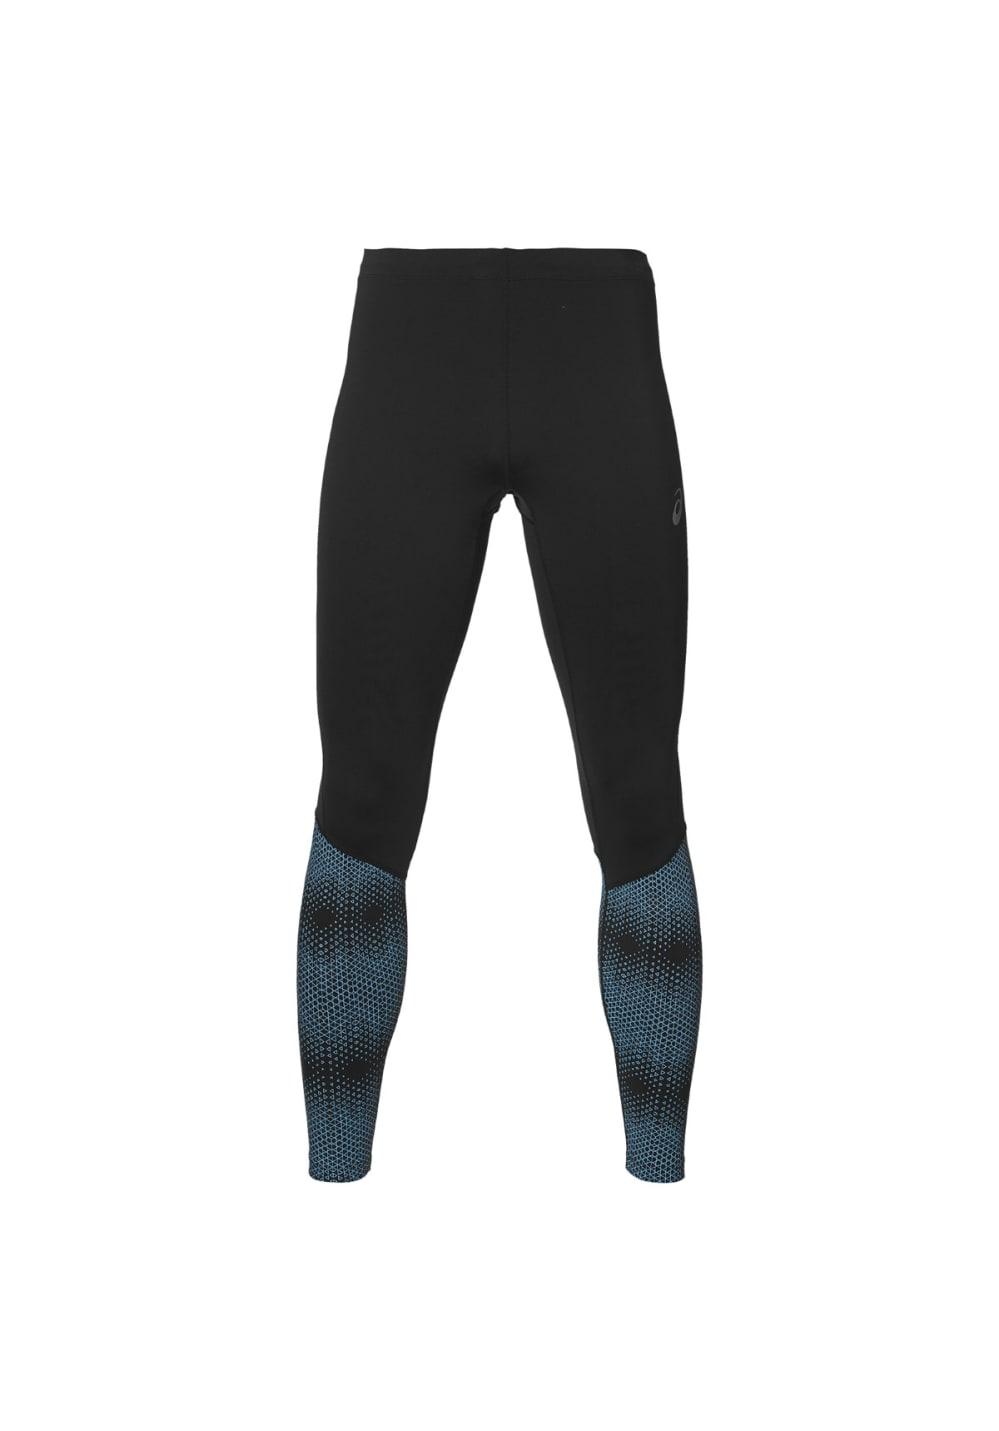 b3a4db95 ASICS Race Tight - Running trousers for Men - Black